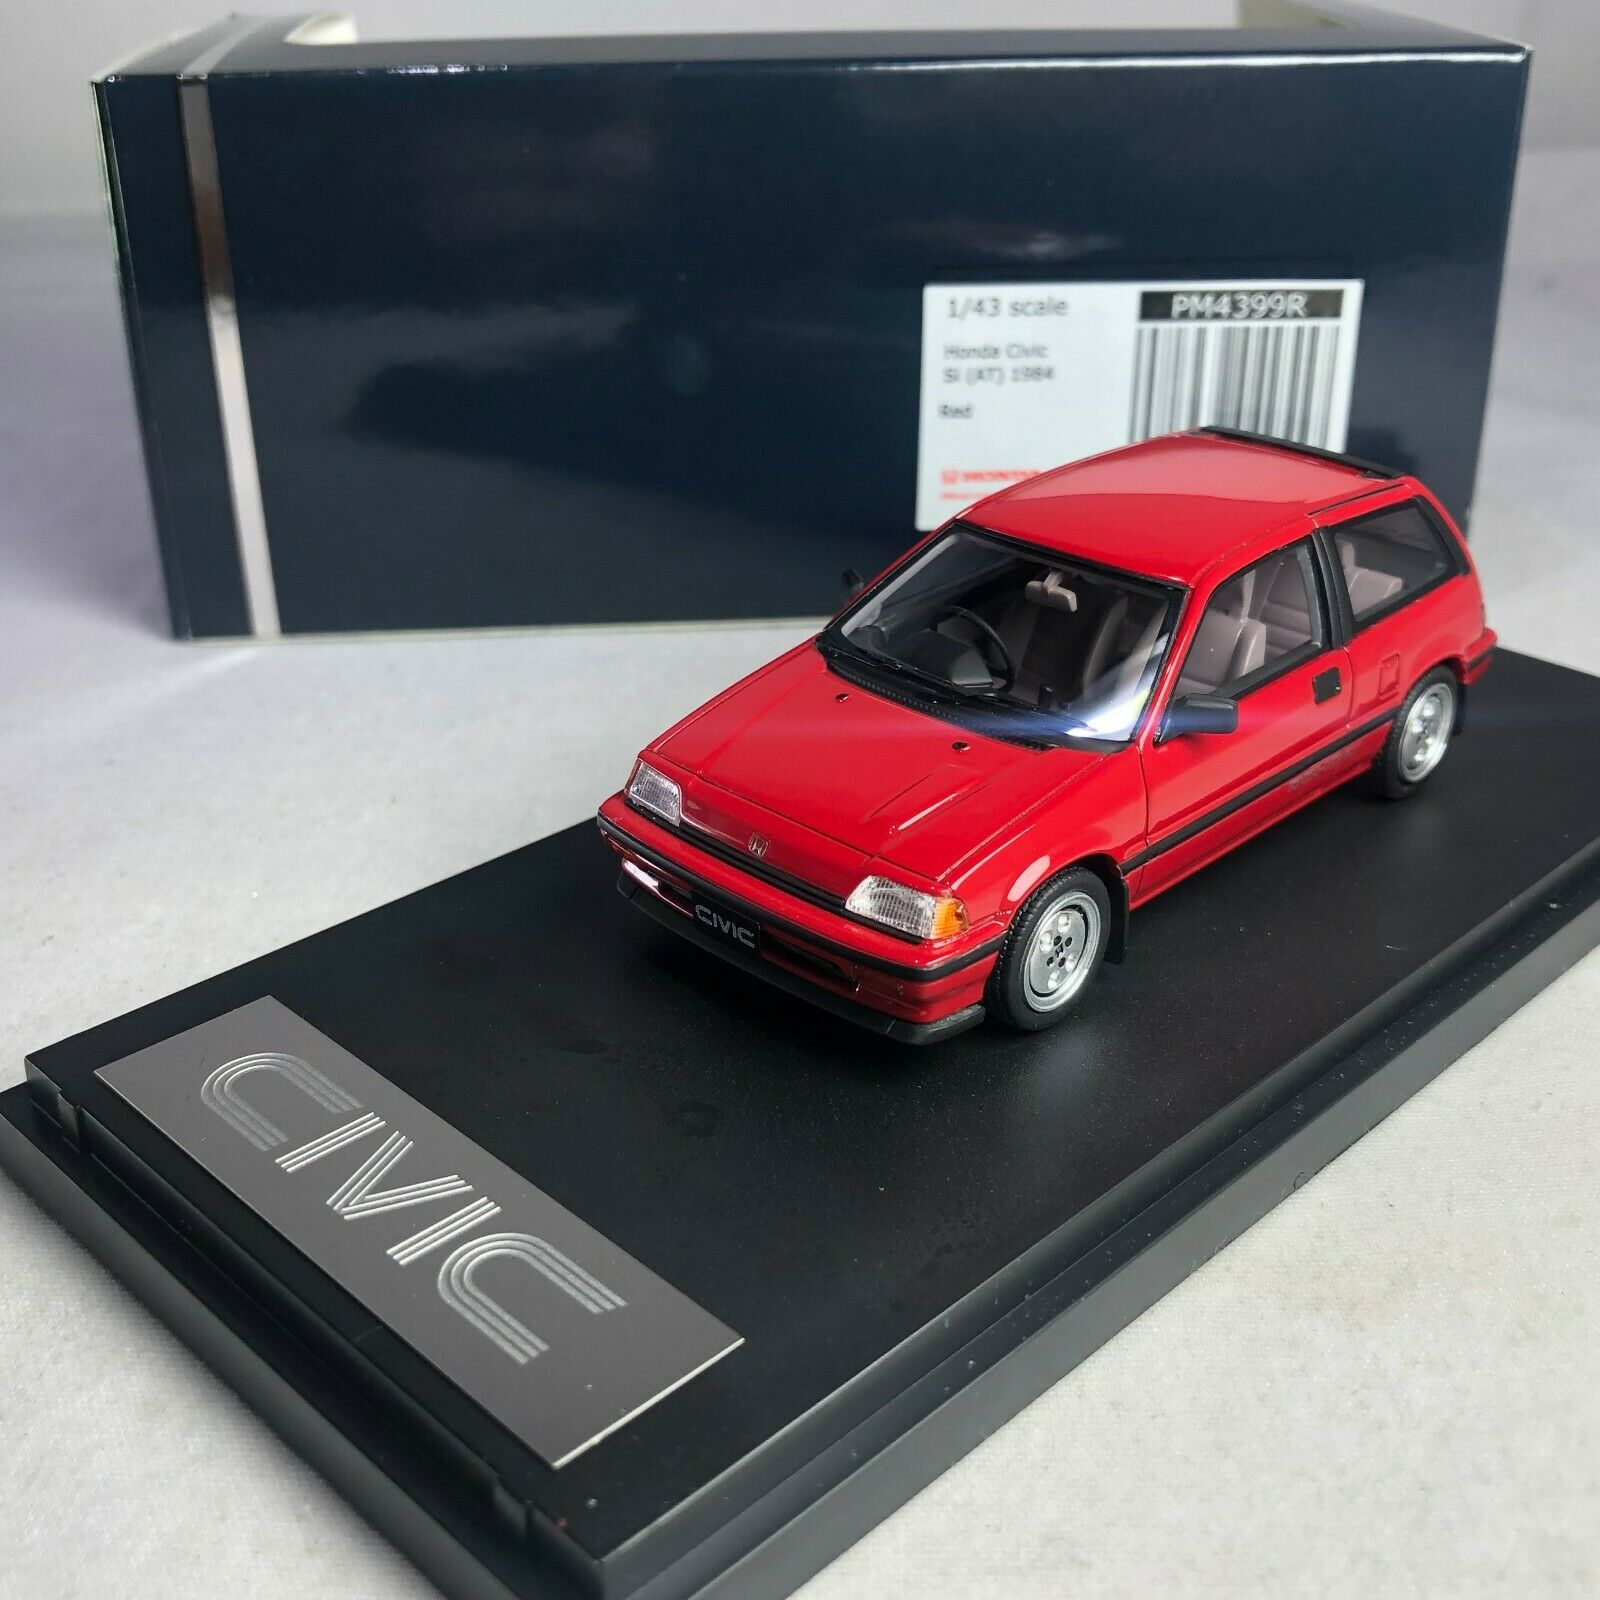 1 43 Mark 43 Honda Civic Si en 1984 Rojo PM4399R G